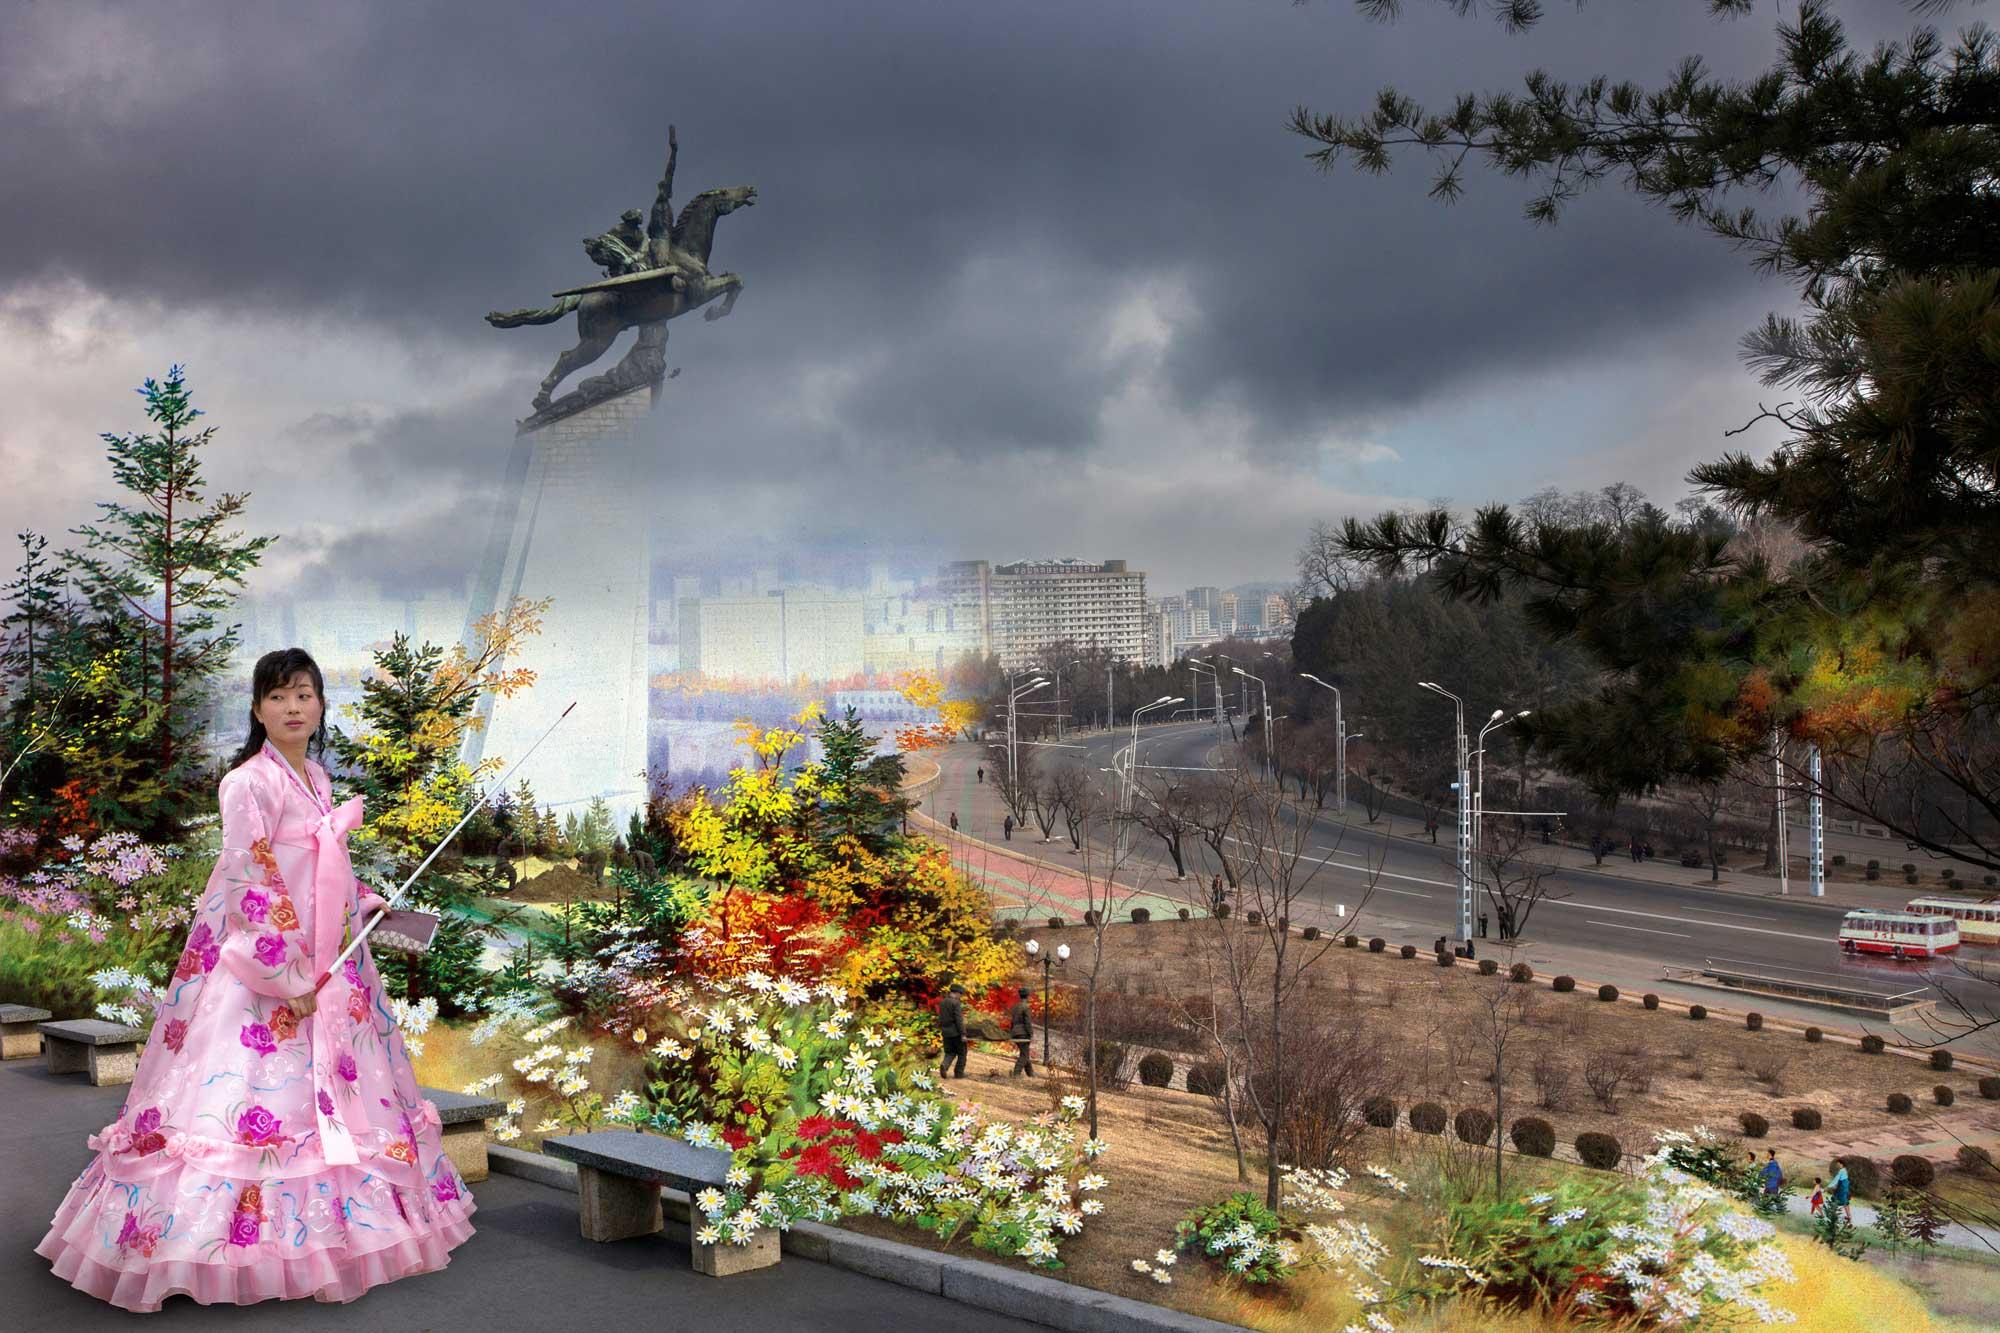 Propaganda Teachings. From series North Korea - A Life between Propaganda and Reality.